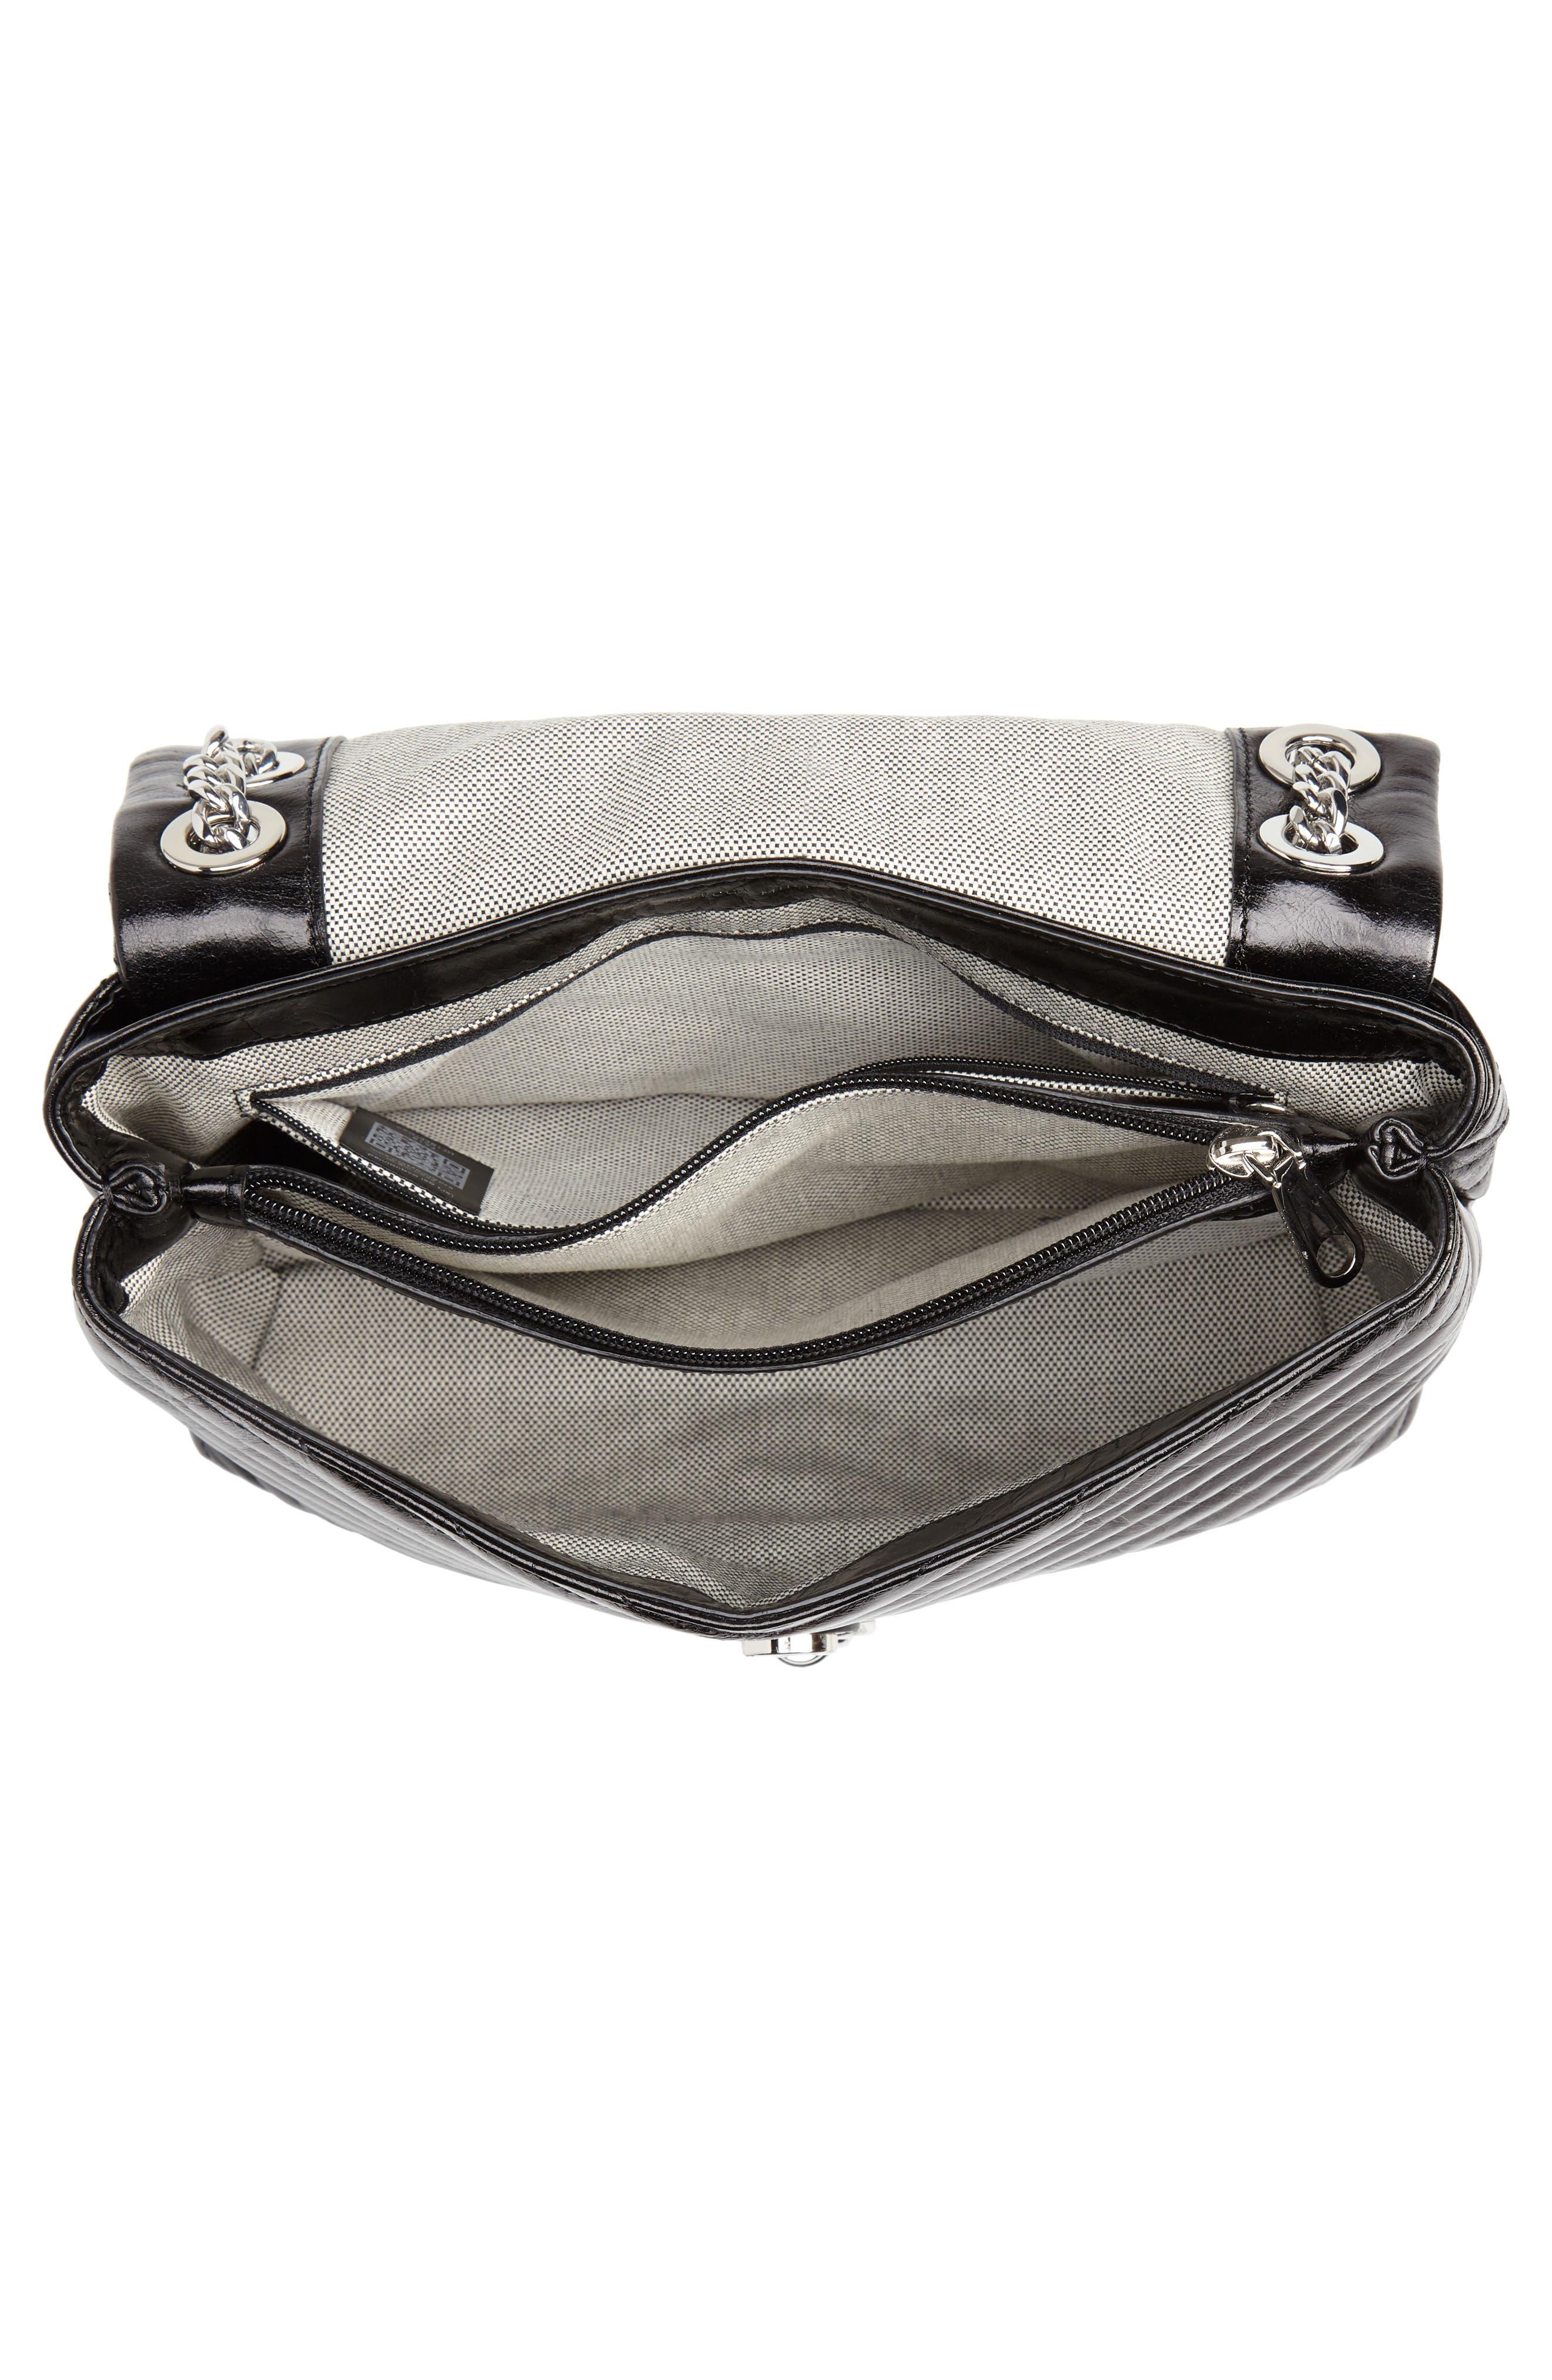 Edie Flap Front Leather Shoulder Bag,                             Alternate thumbnail 4, color,                             BLACK